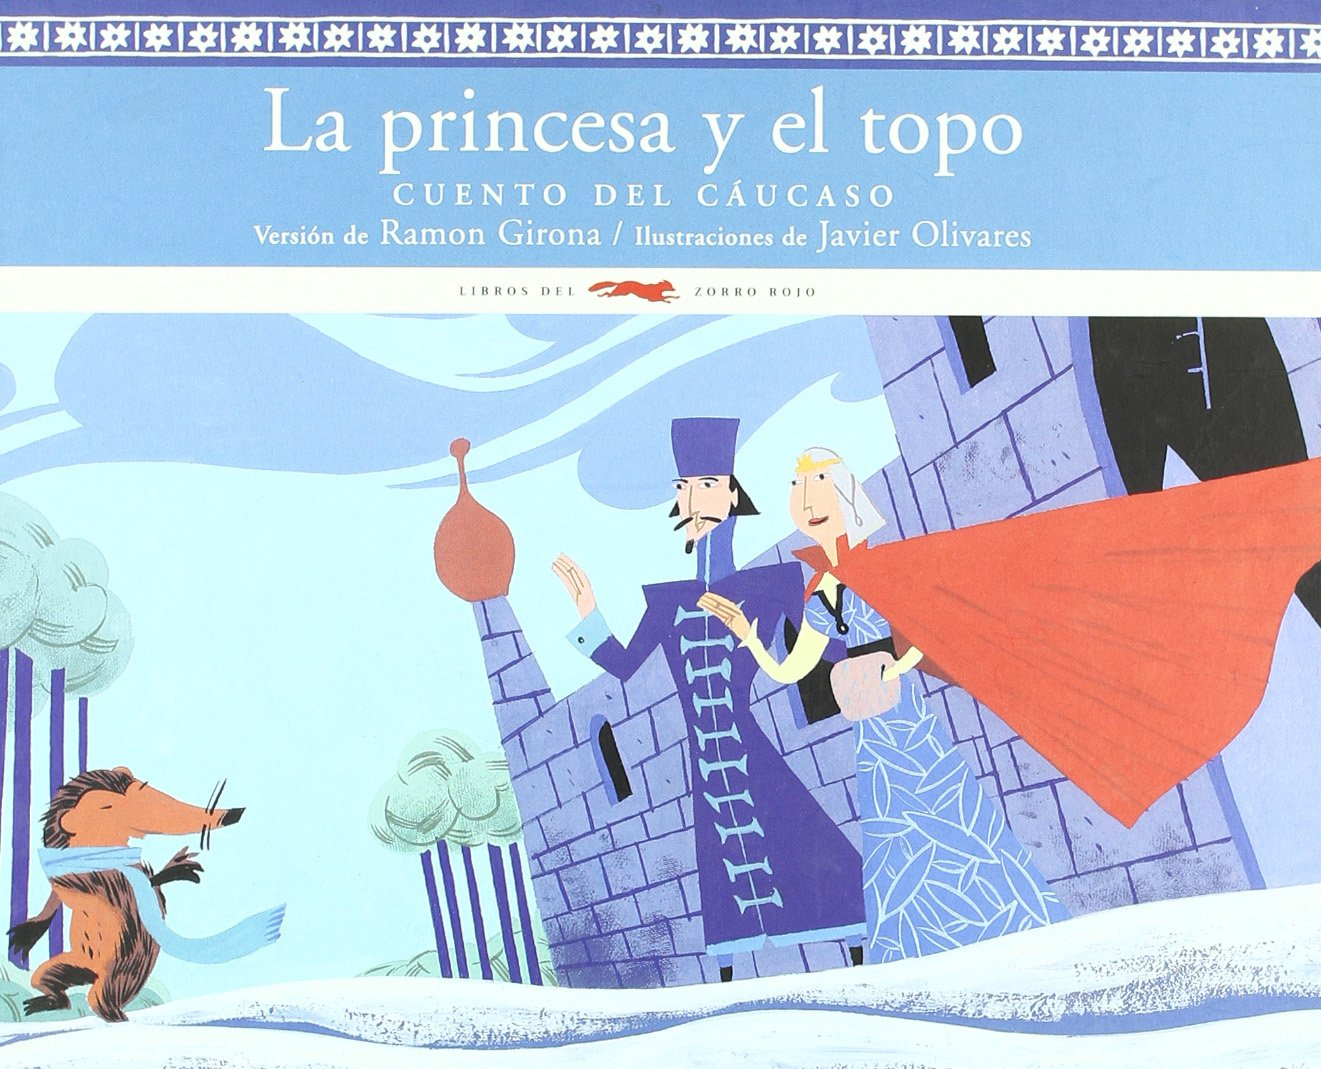 Amazon.com: La princesa y el topo (9788492412464): GIRONA: Books